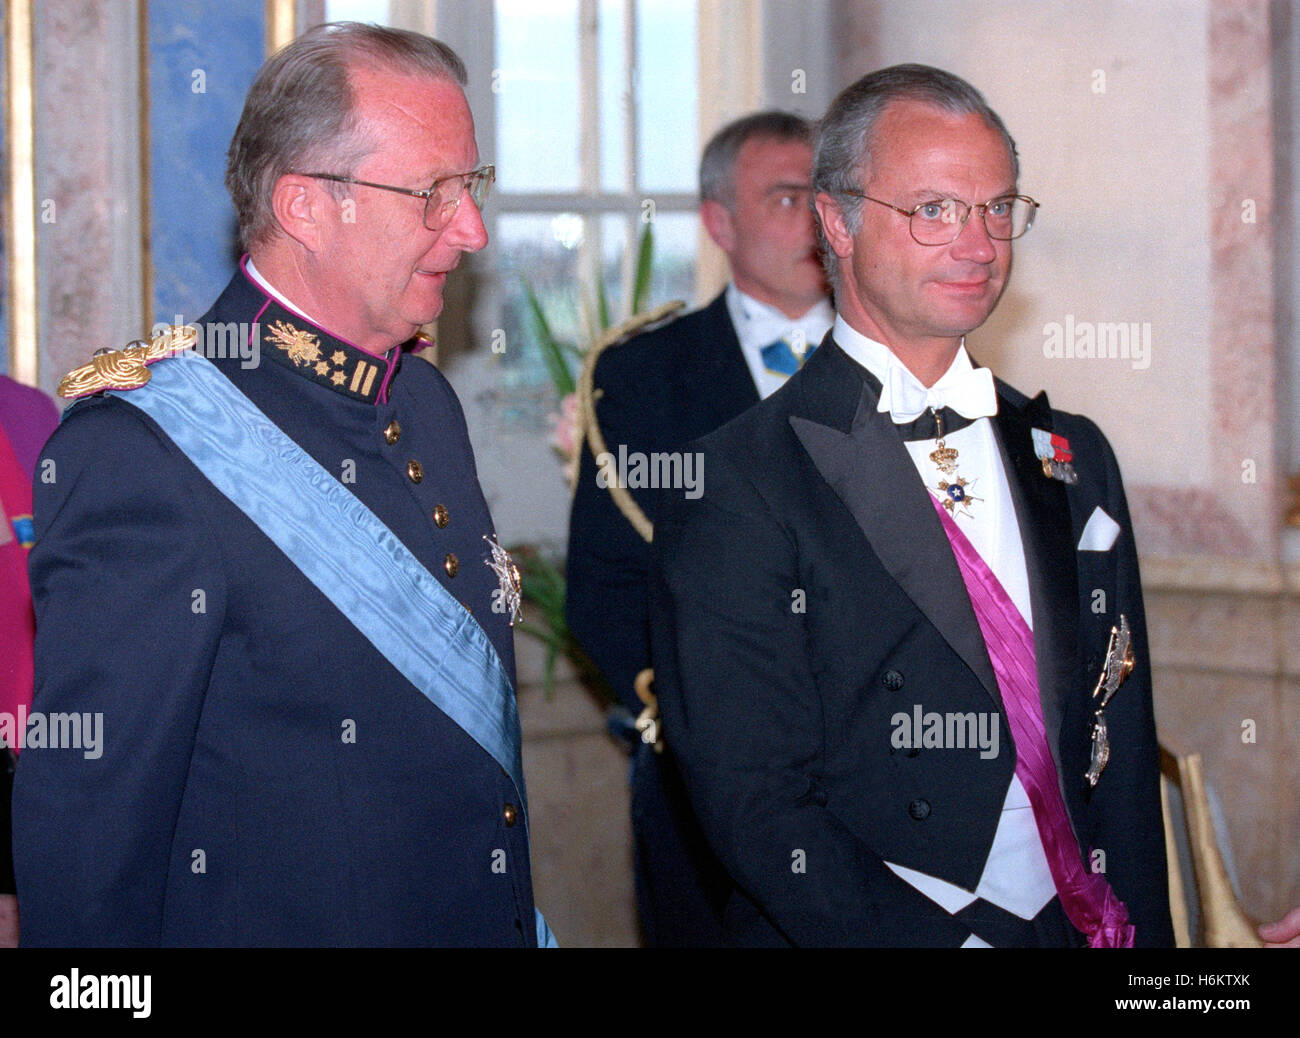 BELGIUM KING ALBERT II and Swedish King Carl XVI Gustav at State visit to Stockholm and a gala dinner at Royal Palace - Stock Image